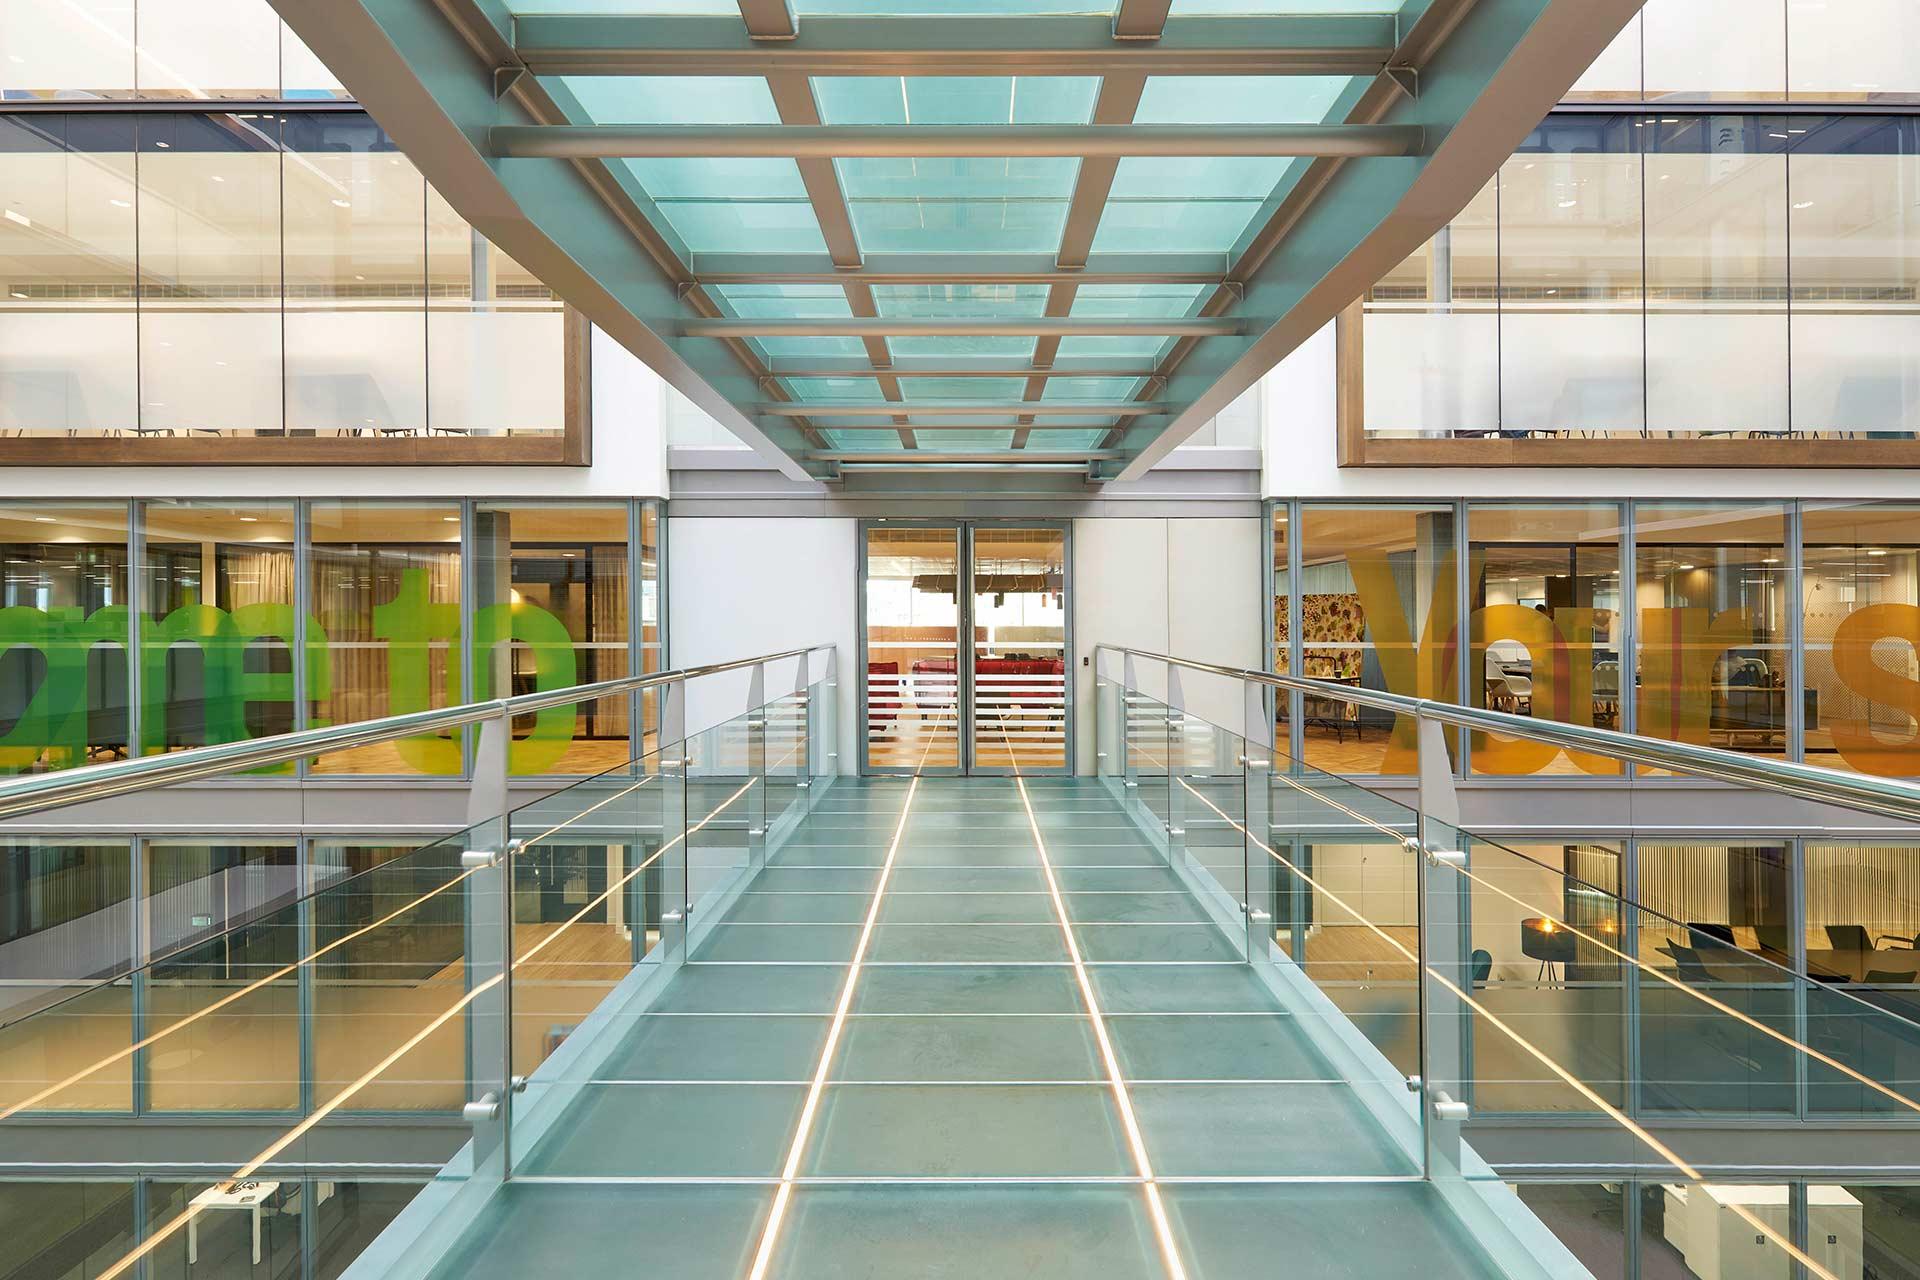 Kilburn & Strode LLP | Lacon House